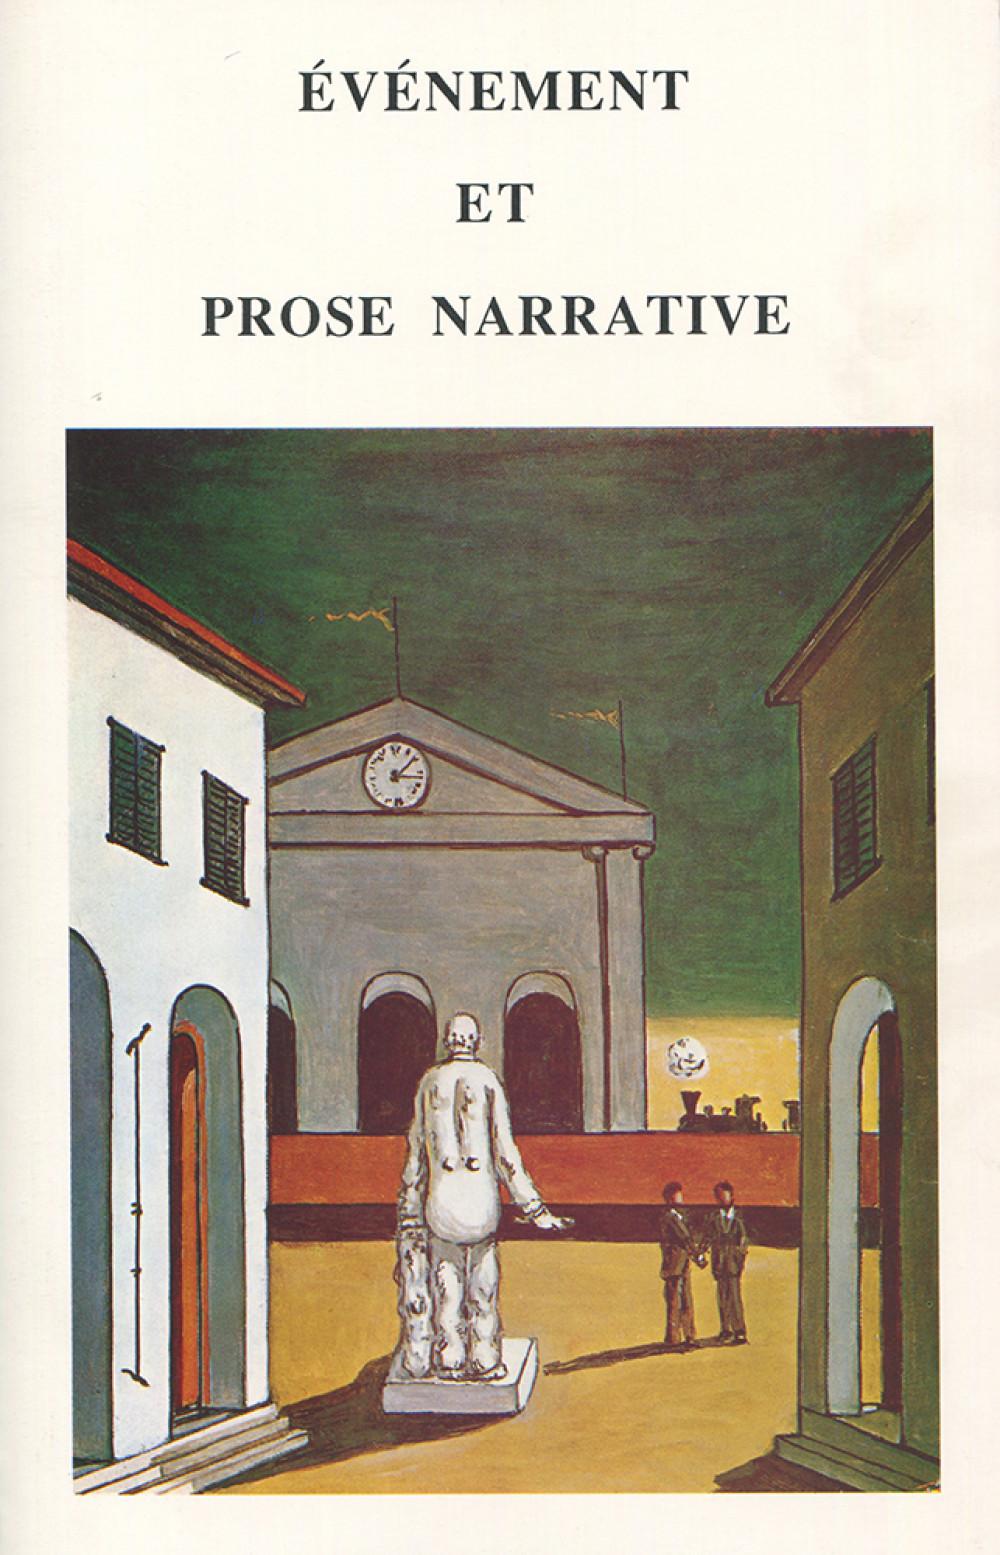 Evénement et prose narrative